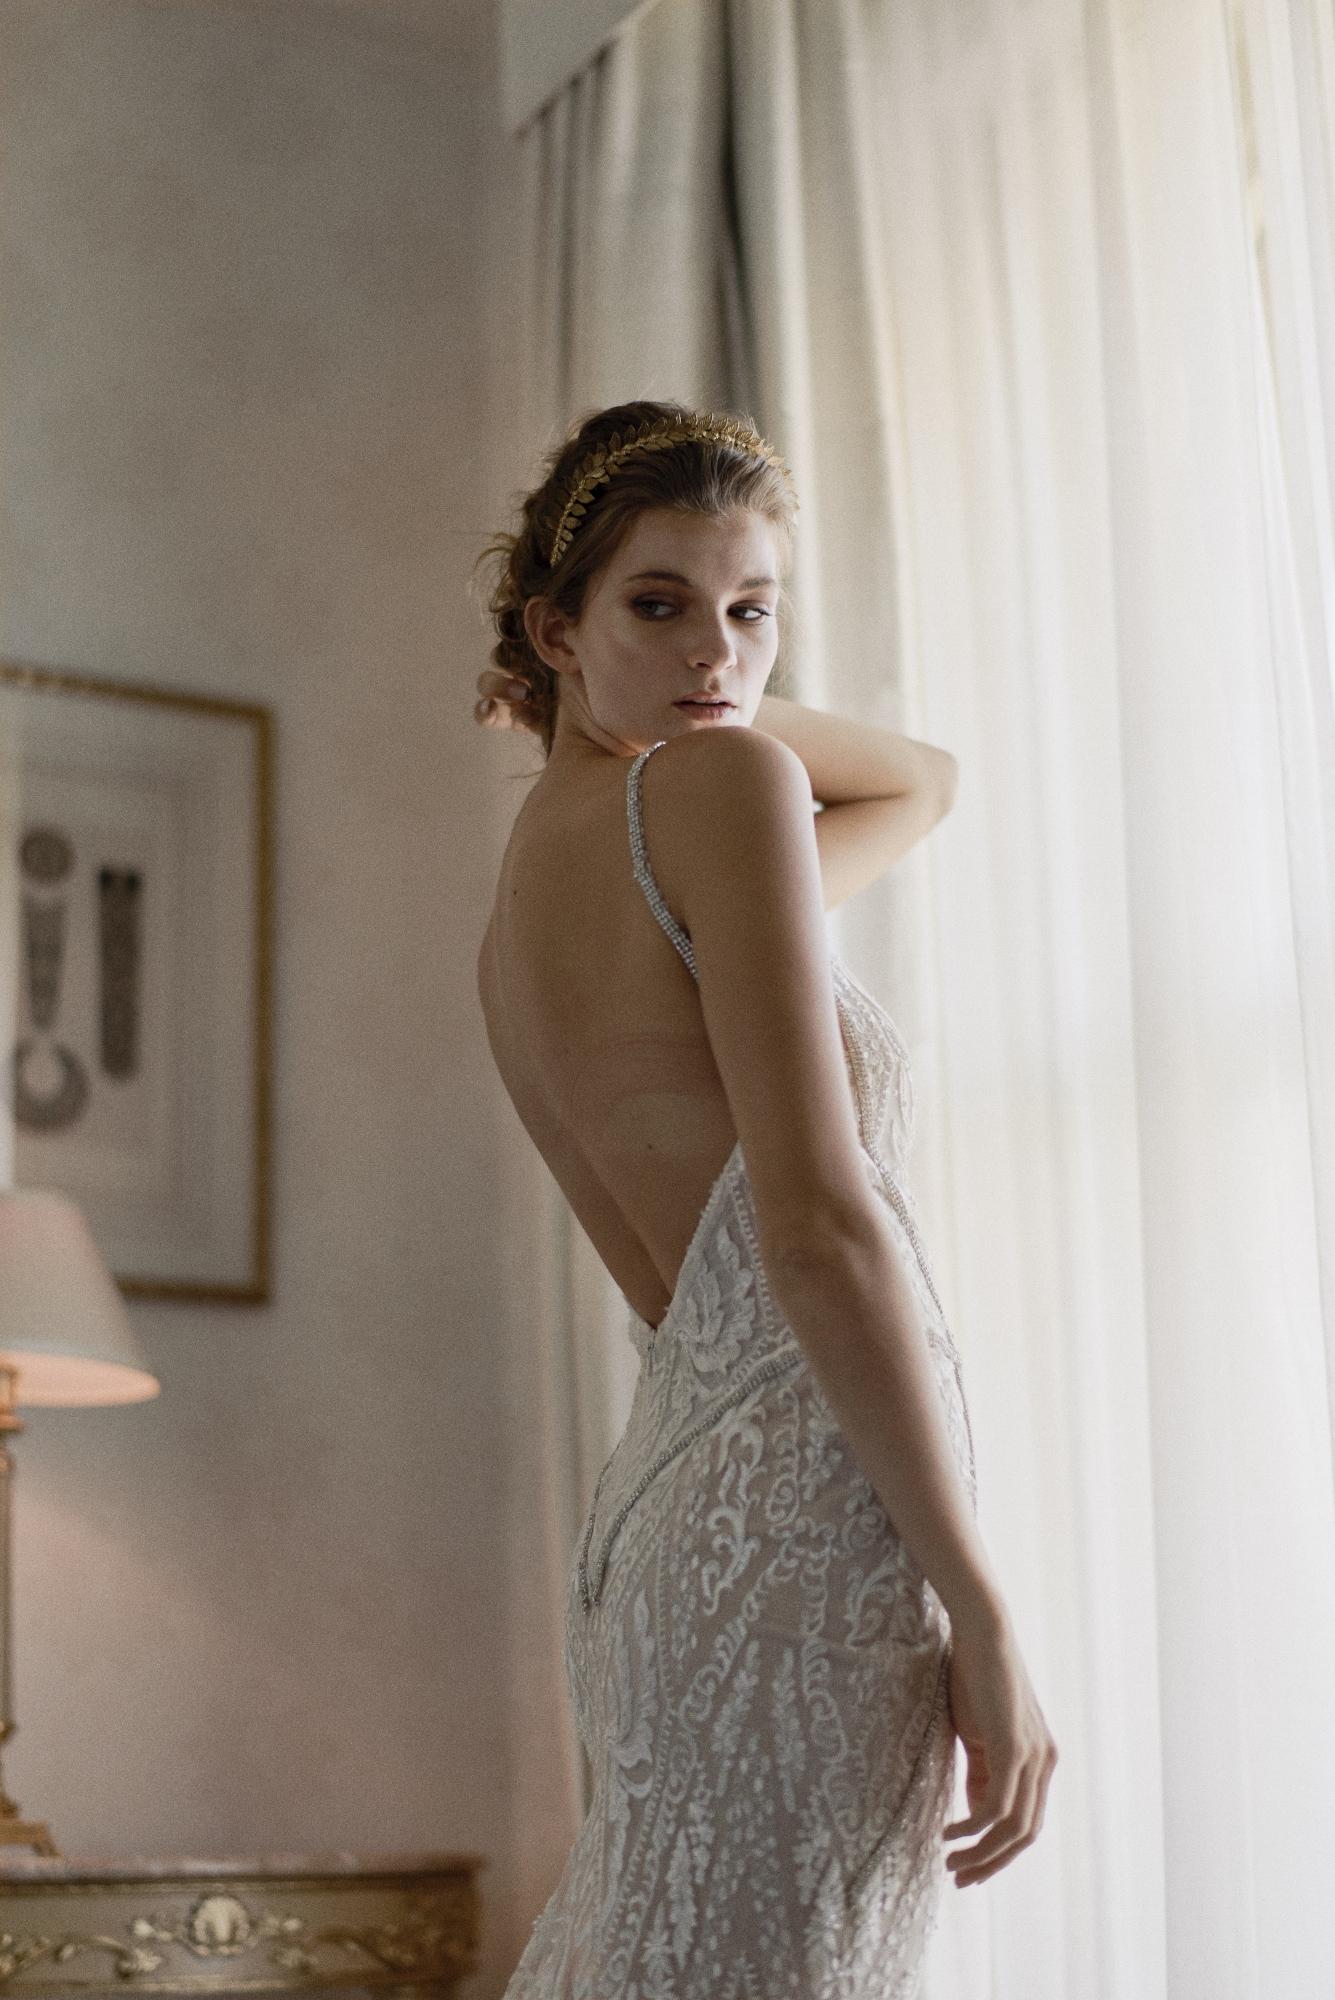 Sephory Photography-Her Morning Elegance Print 104 (1335x2000)